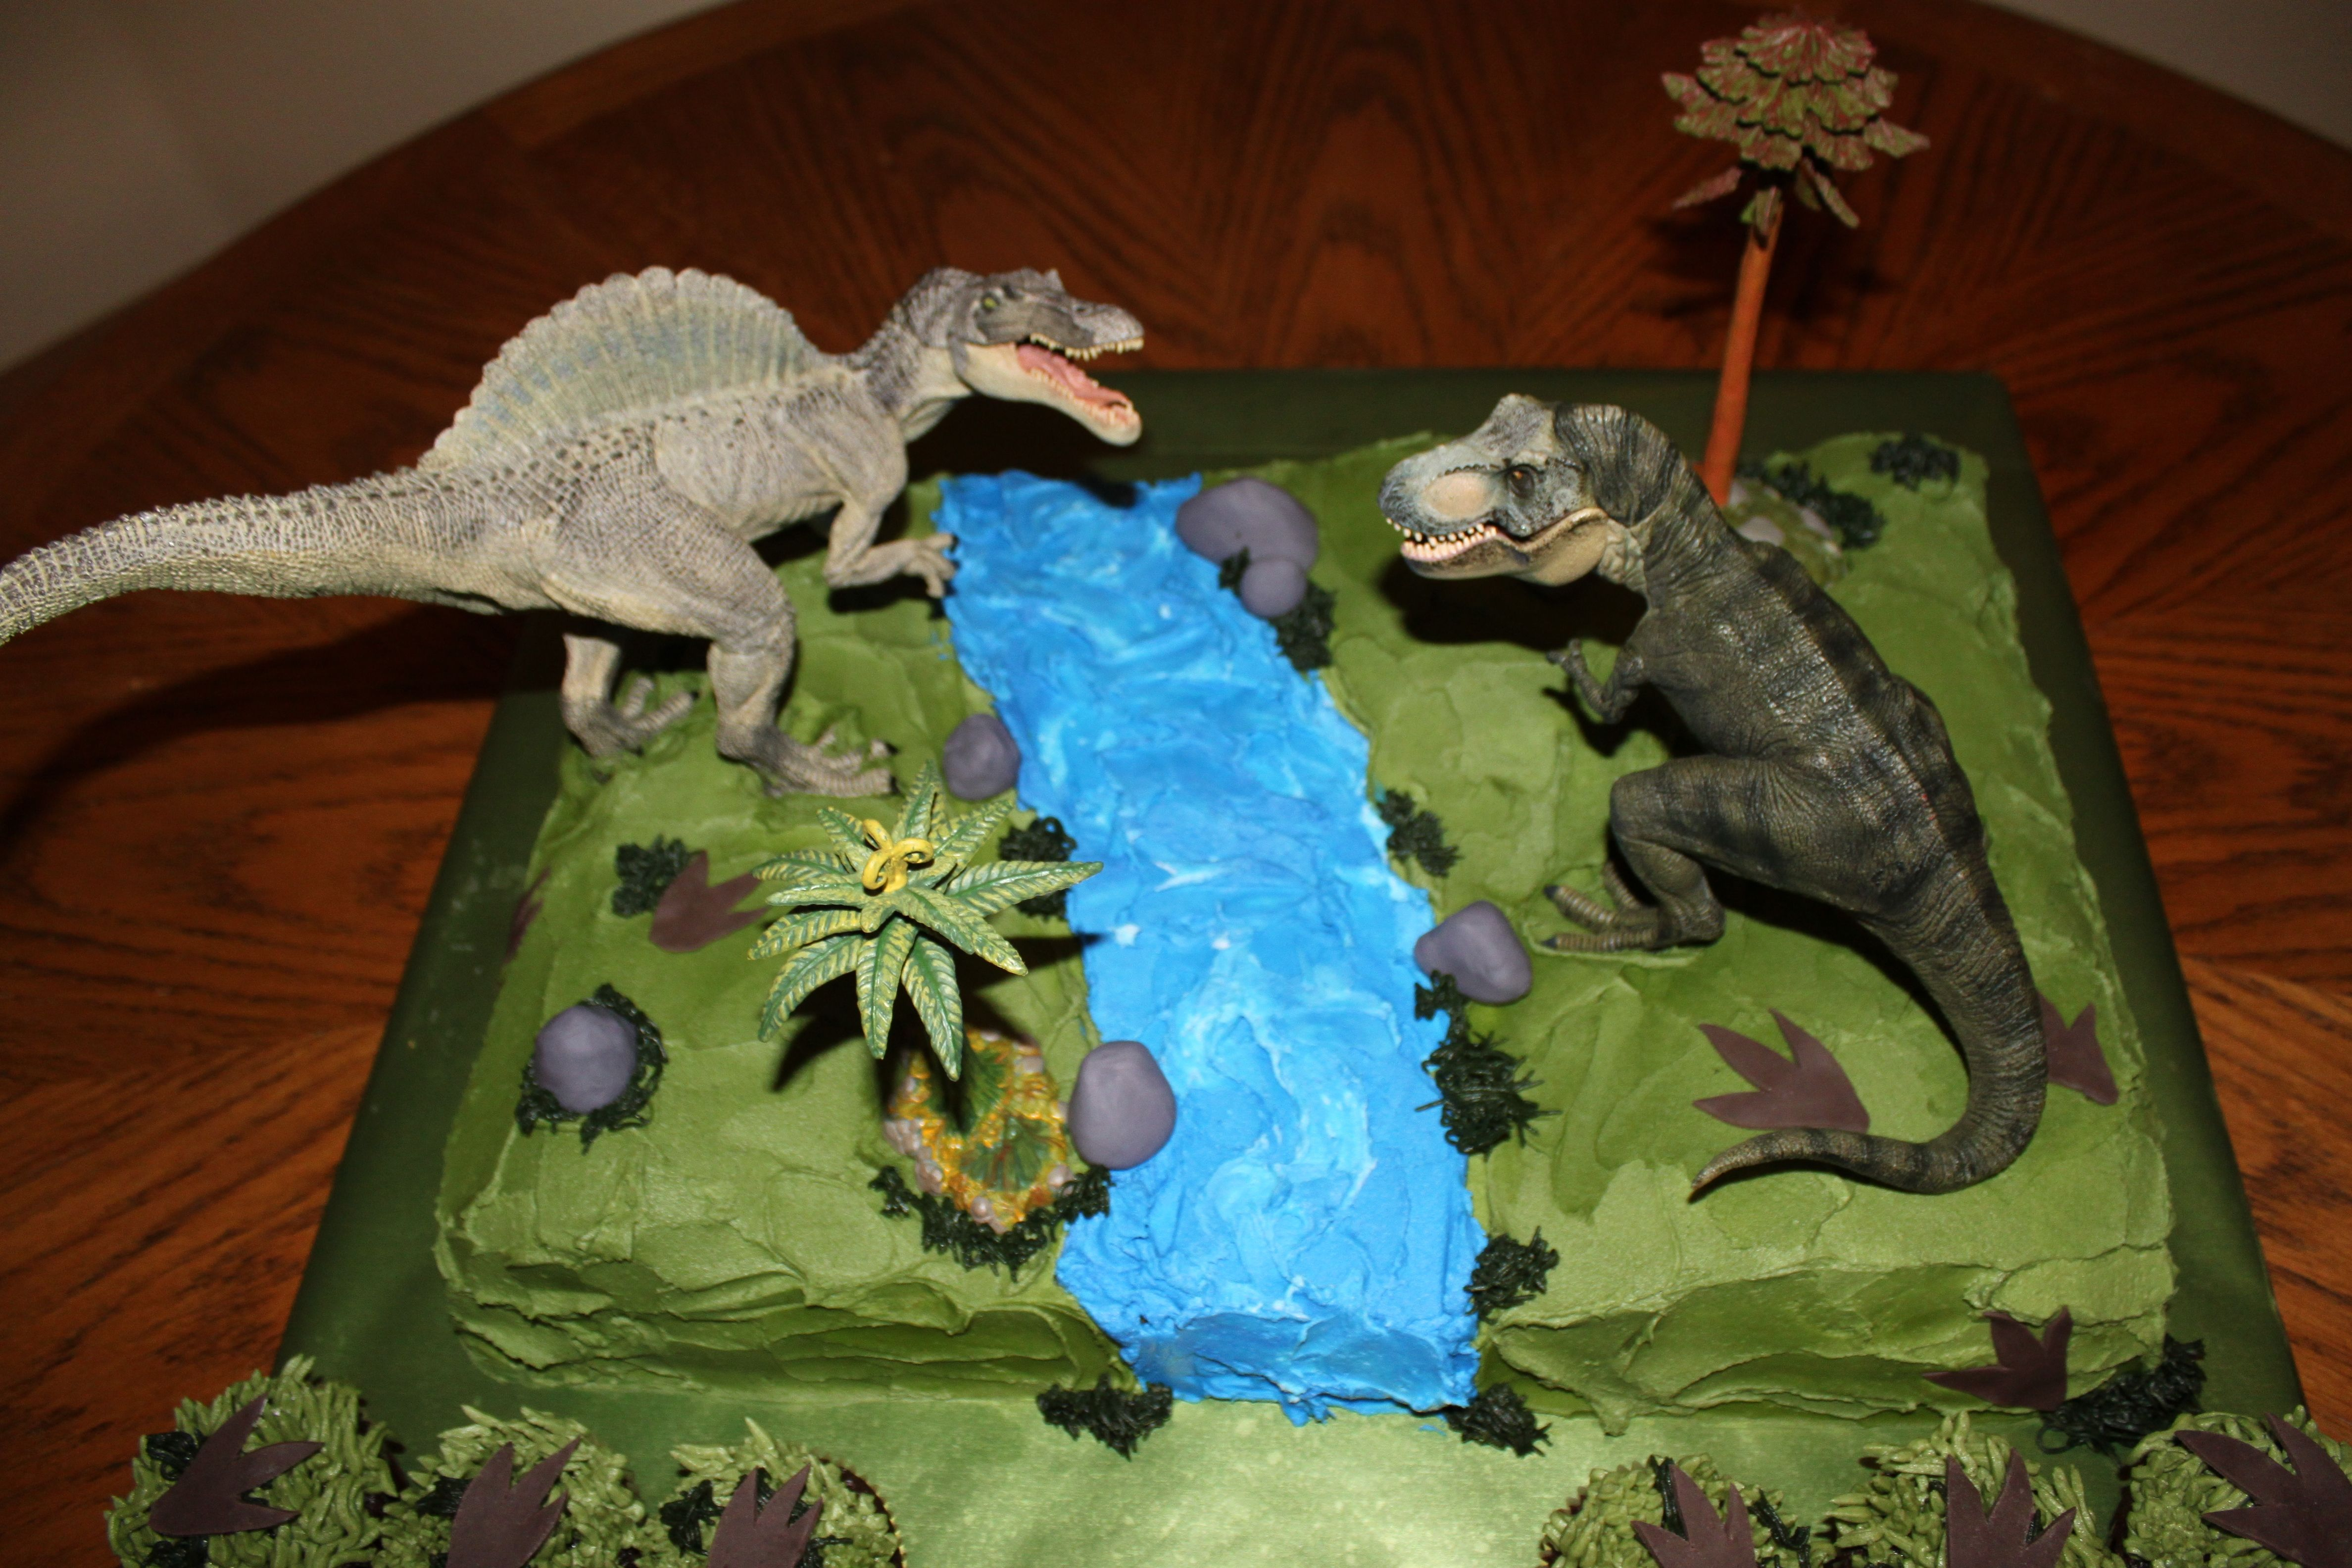 Jurassic park cake original embed cakes cupcakes pinterest park jurassic park party - Jurassic park builder decorations ...